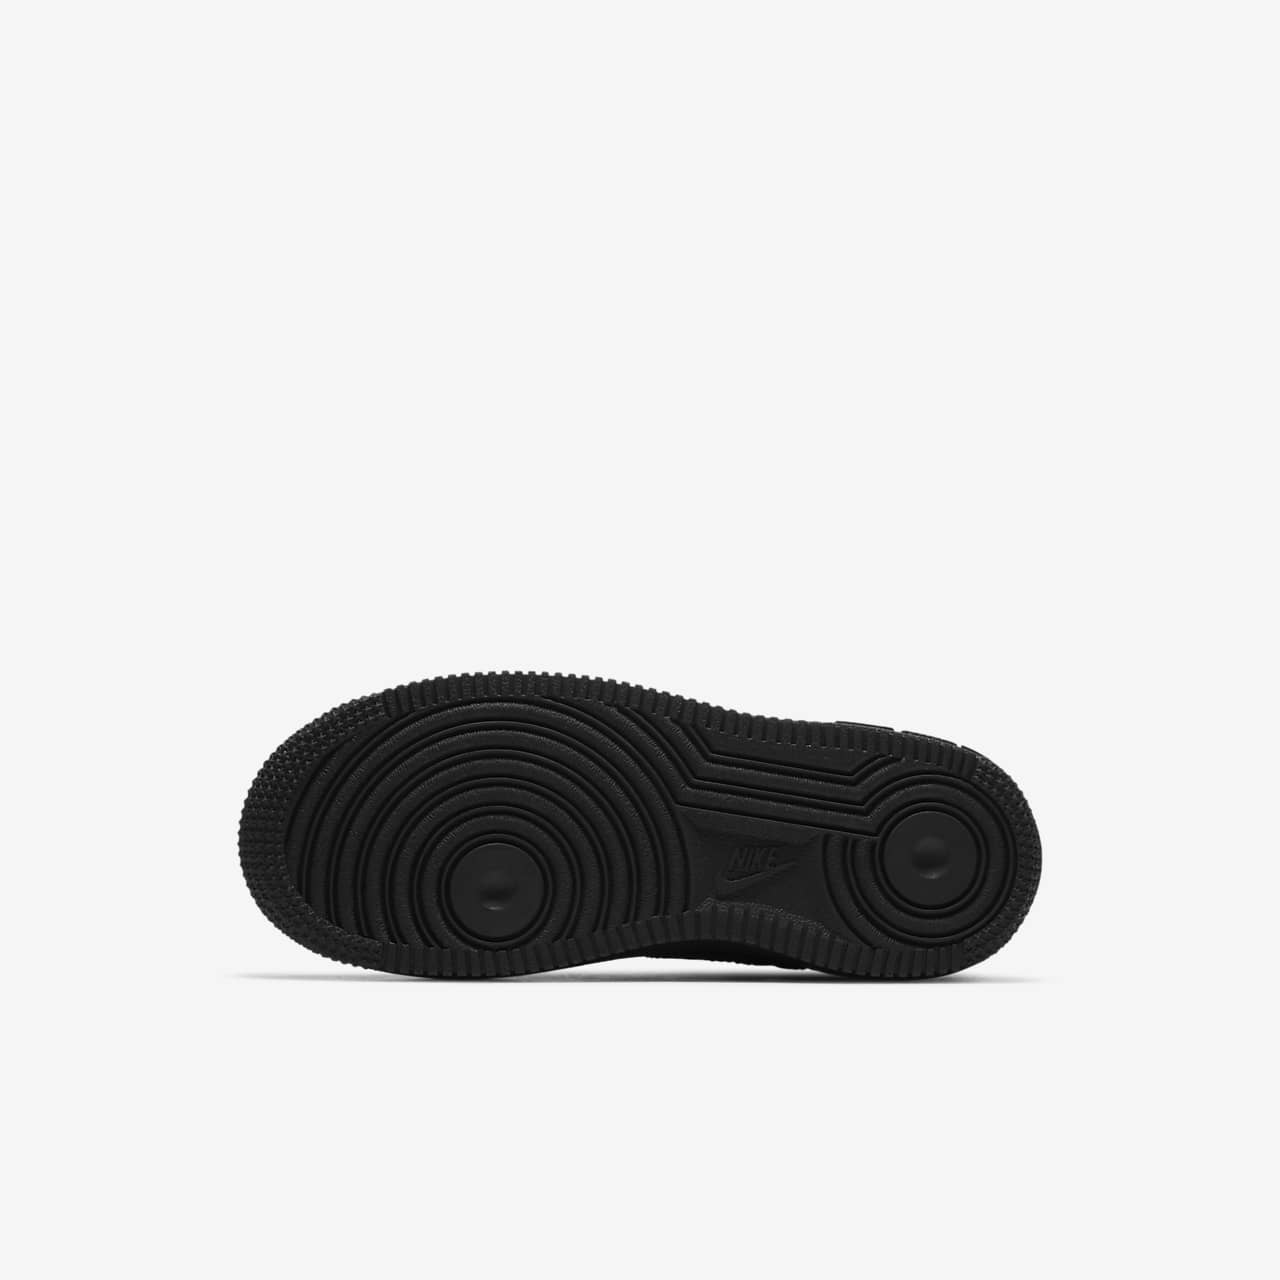 800b047765 Nike Force 1 Little Kids  Shoe. Nike.com